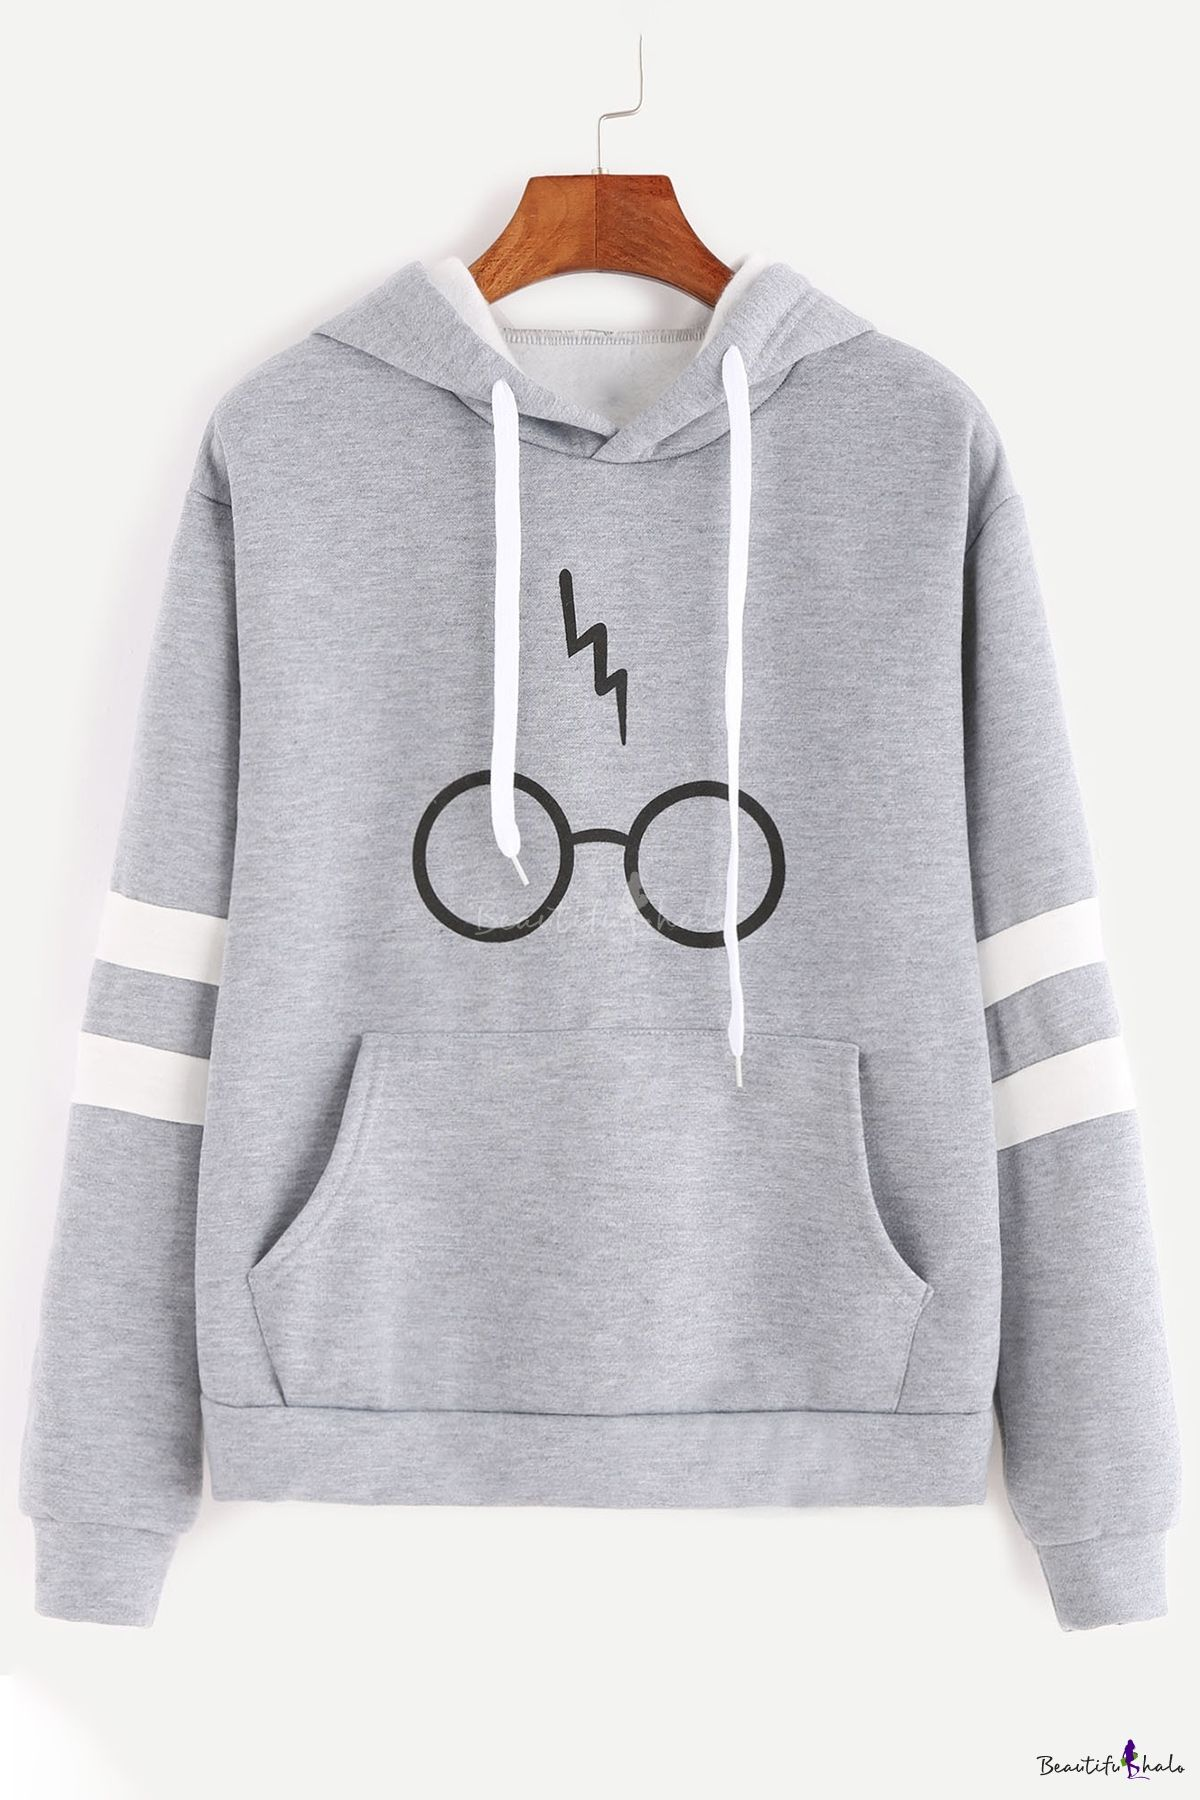 sm Harry Potter Lightning Glasses Sweatshirt Sweater High Quailty SCREEN PRINT